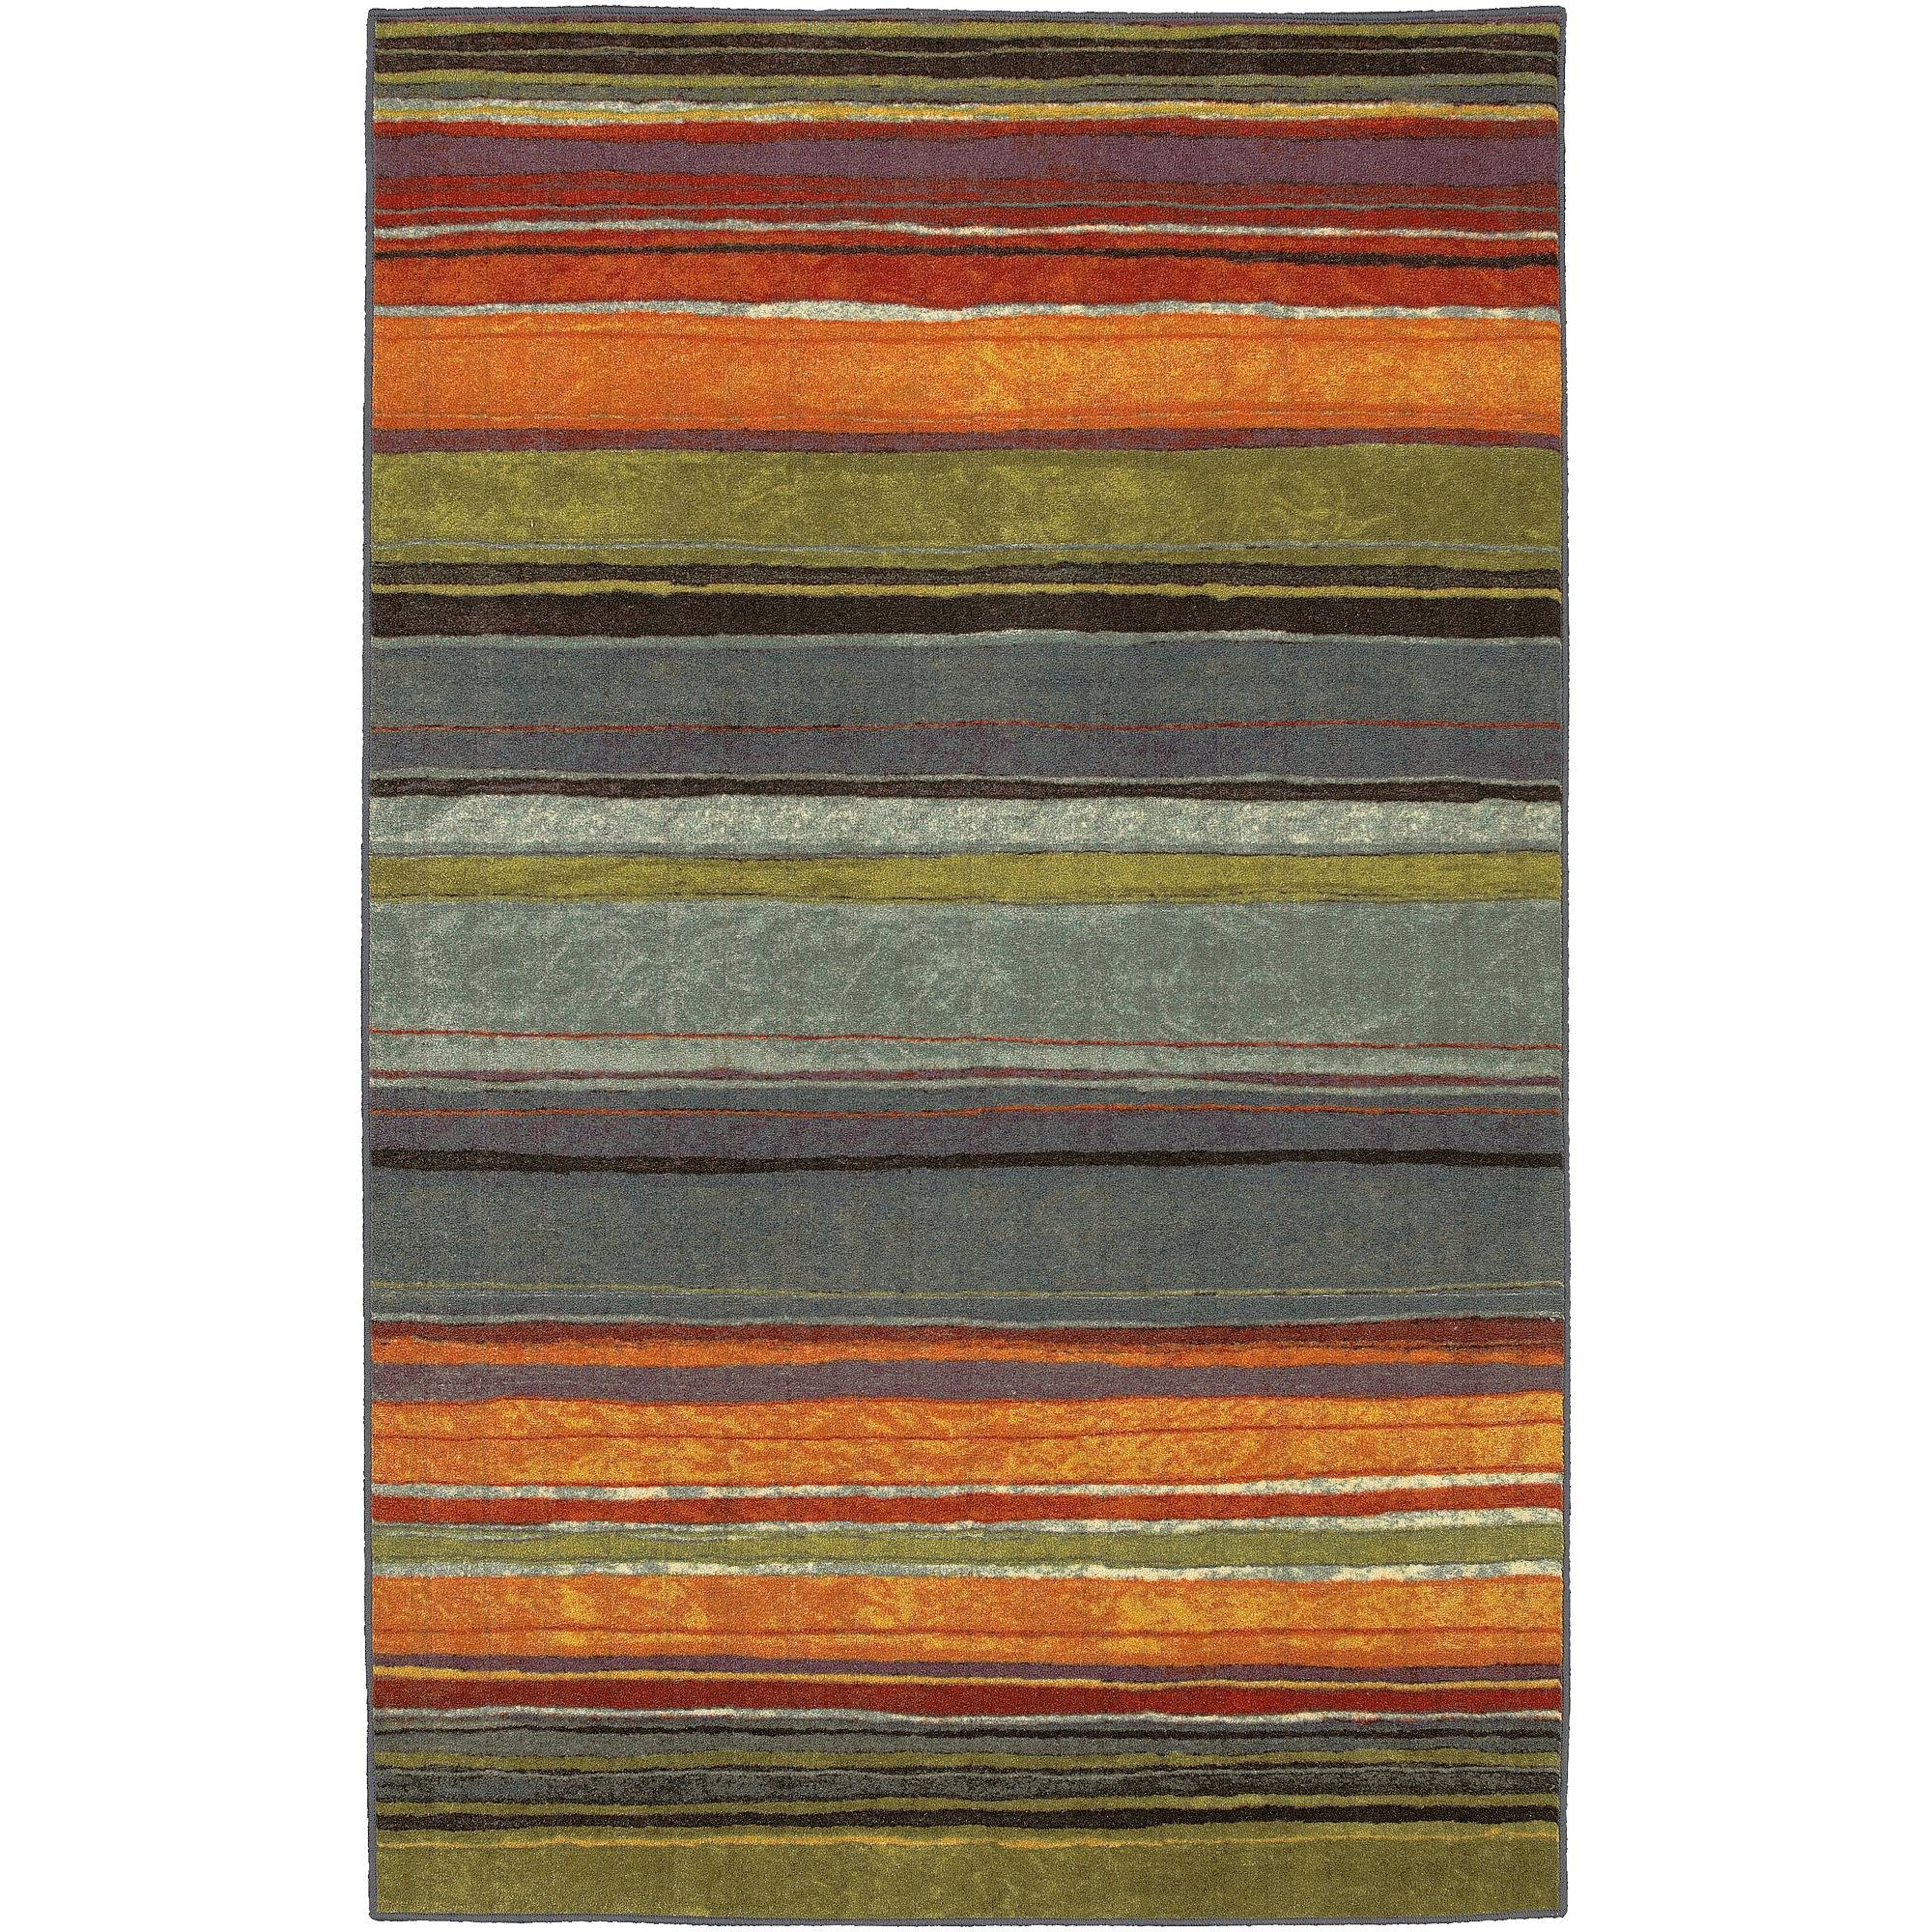 Mohawk Home Rainbow Stripe Rectangular Rug